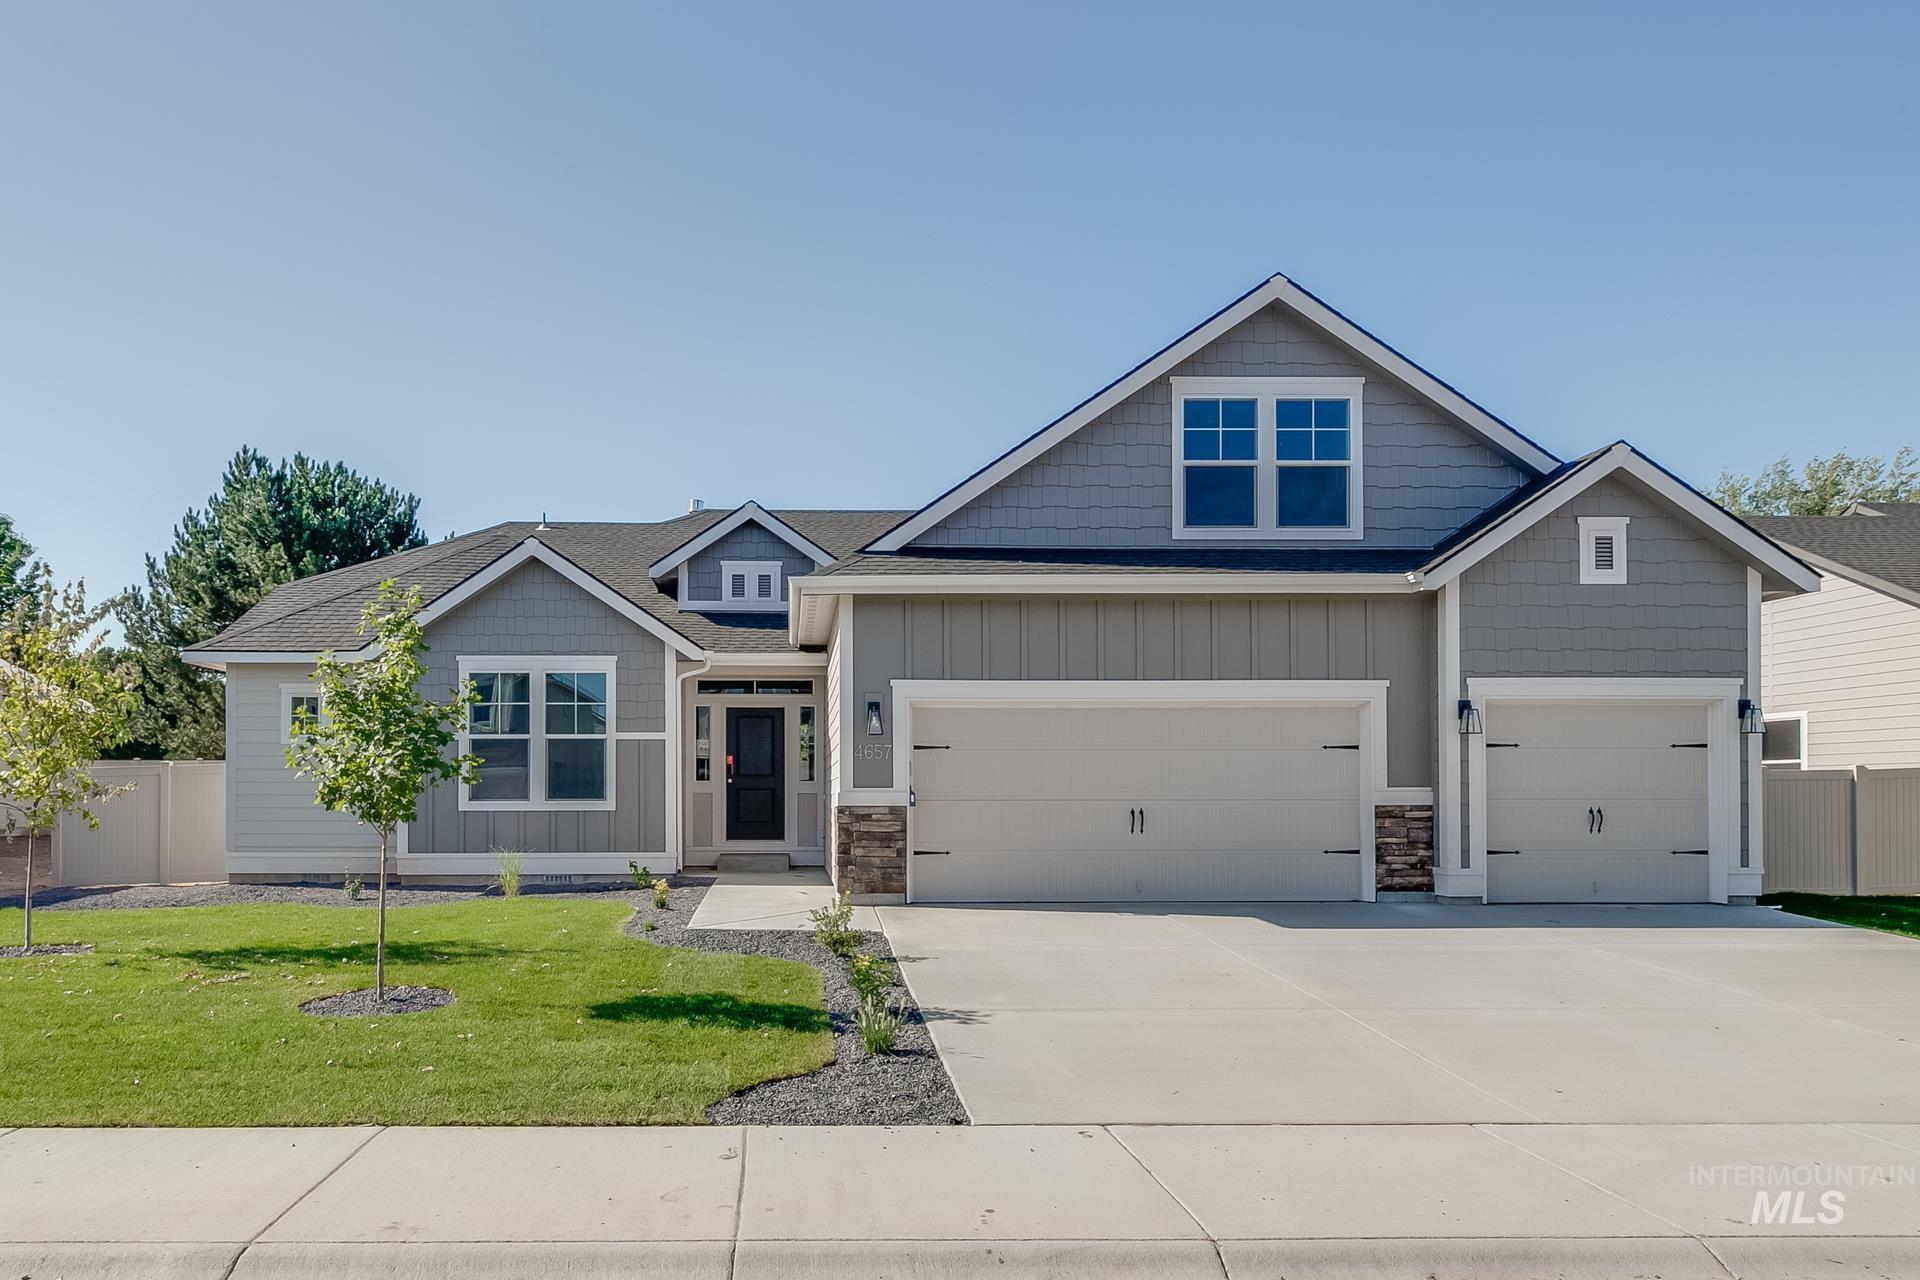 874 W Smallwood Ct Property Photo 1